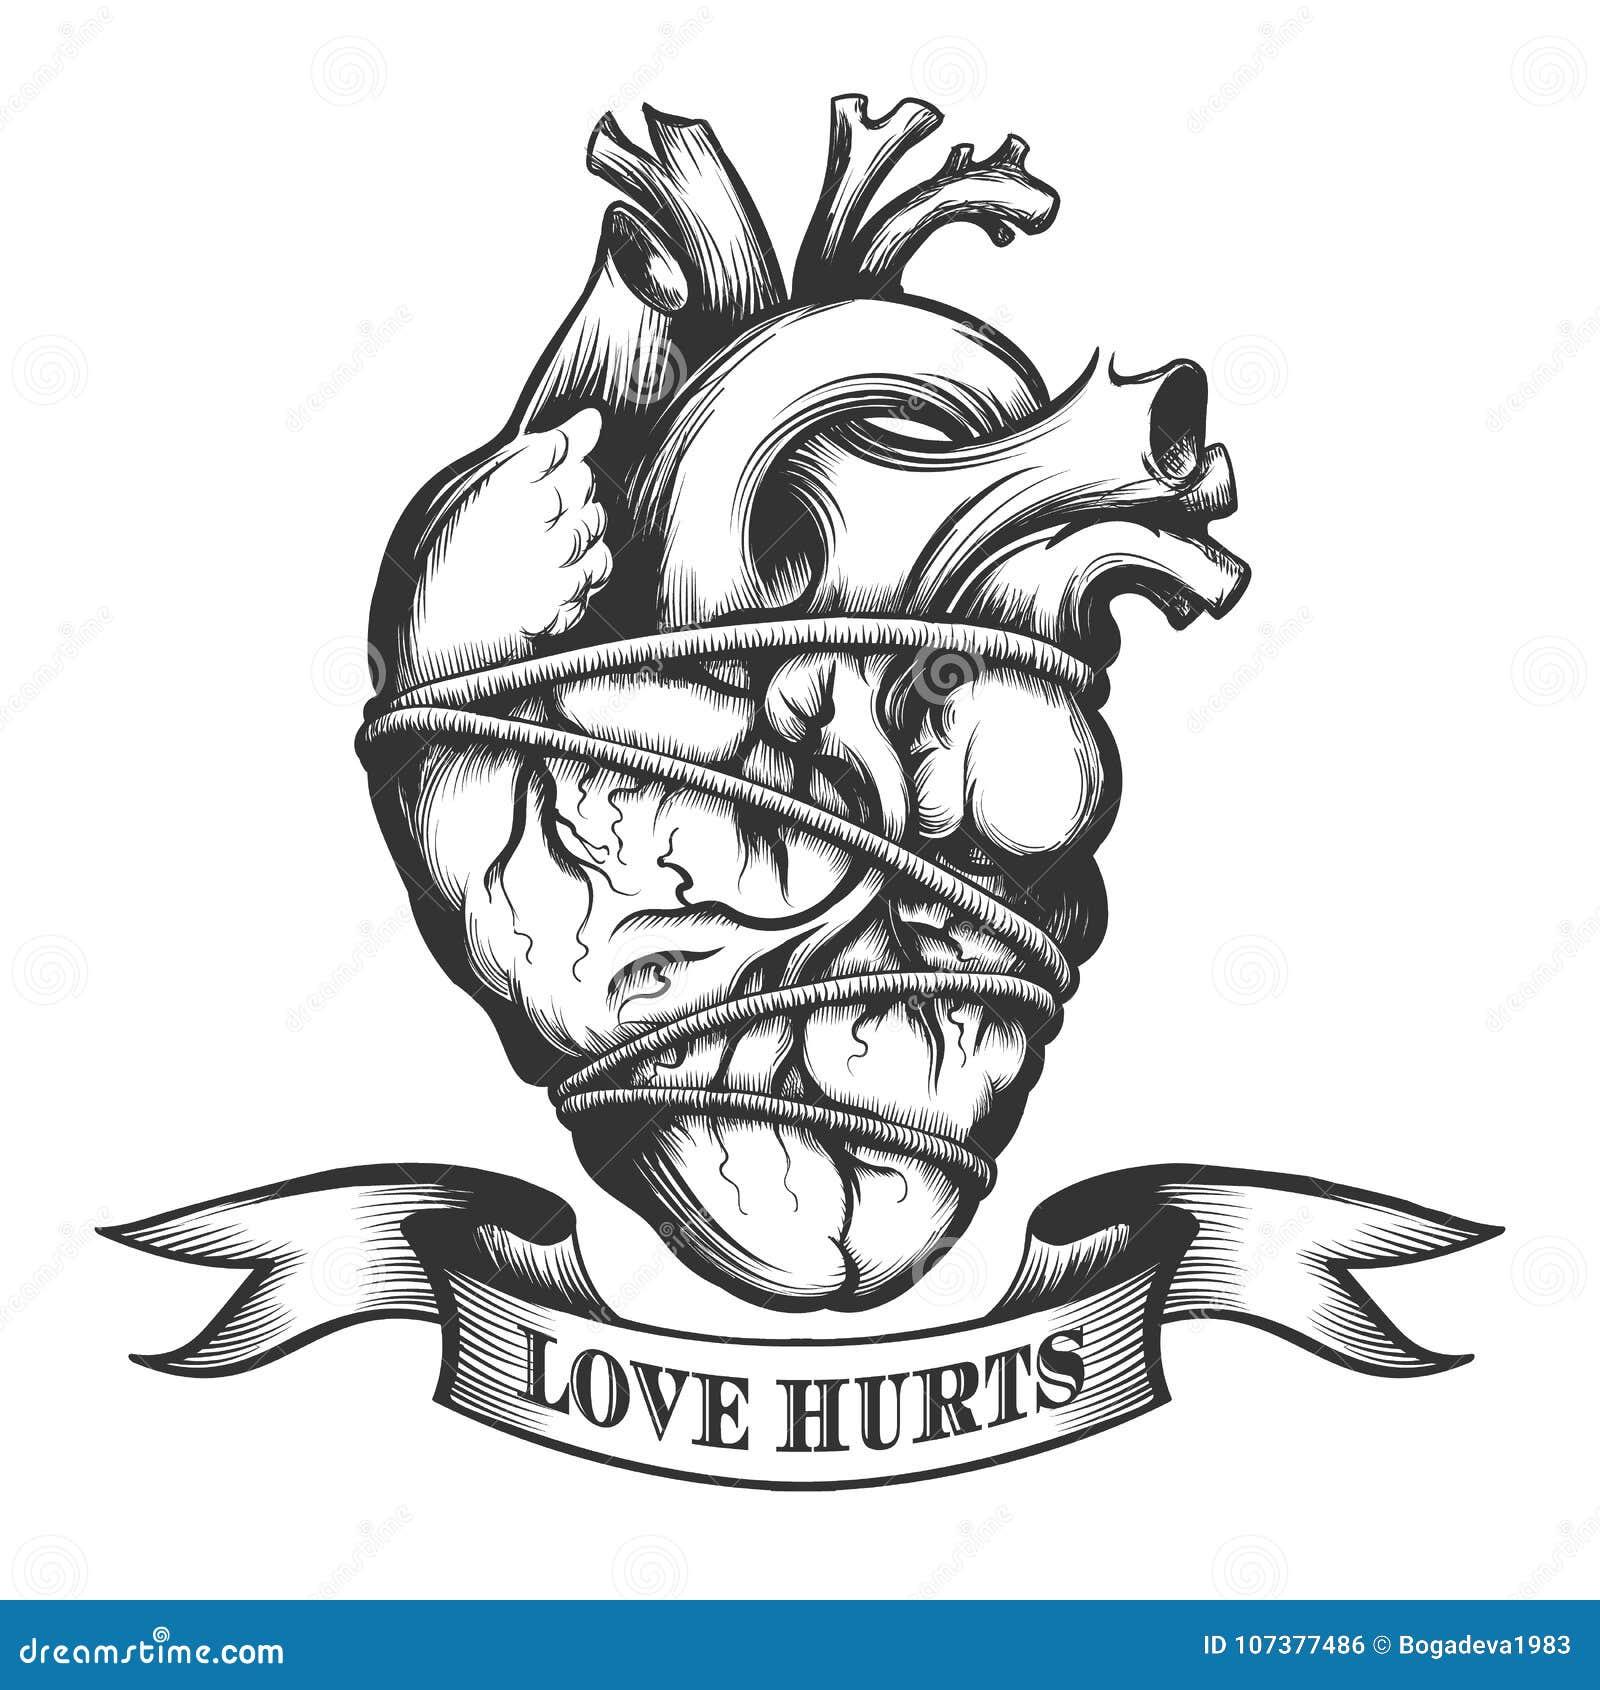 Tied Human Heart stock illustration. Illustration of antique - 107377486